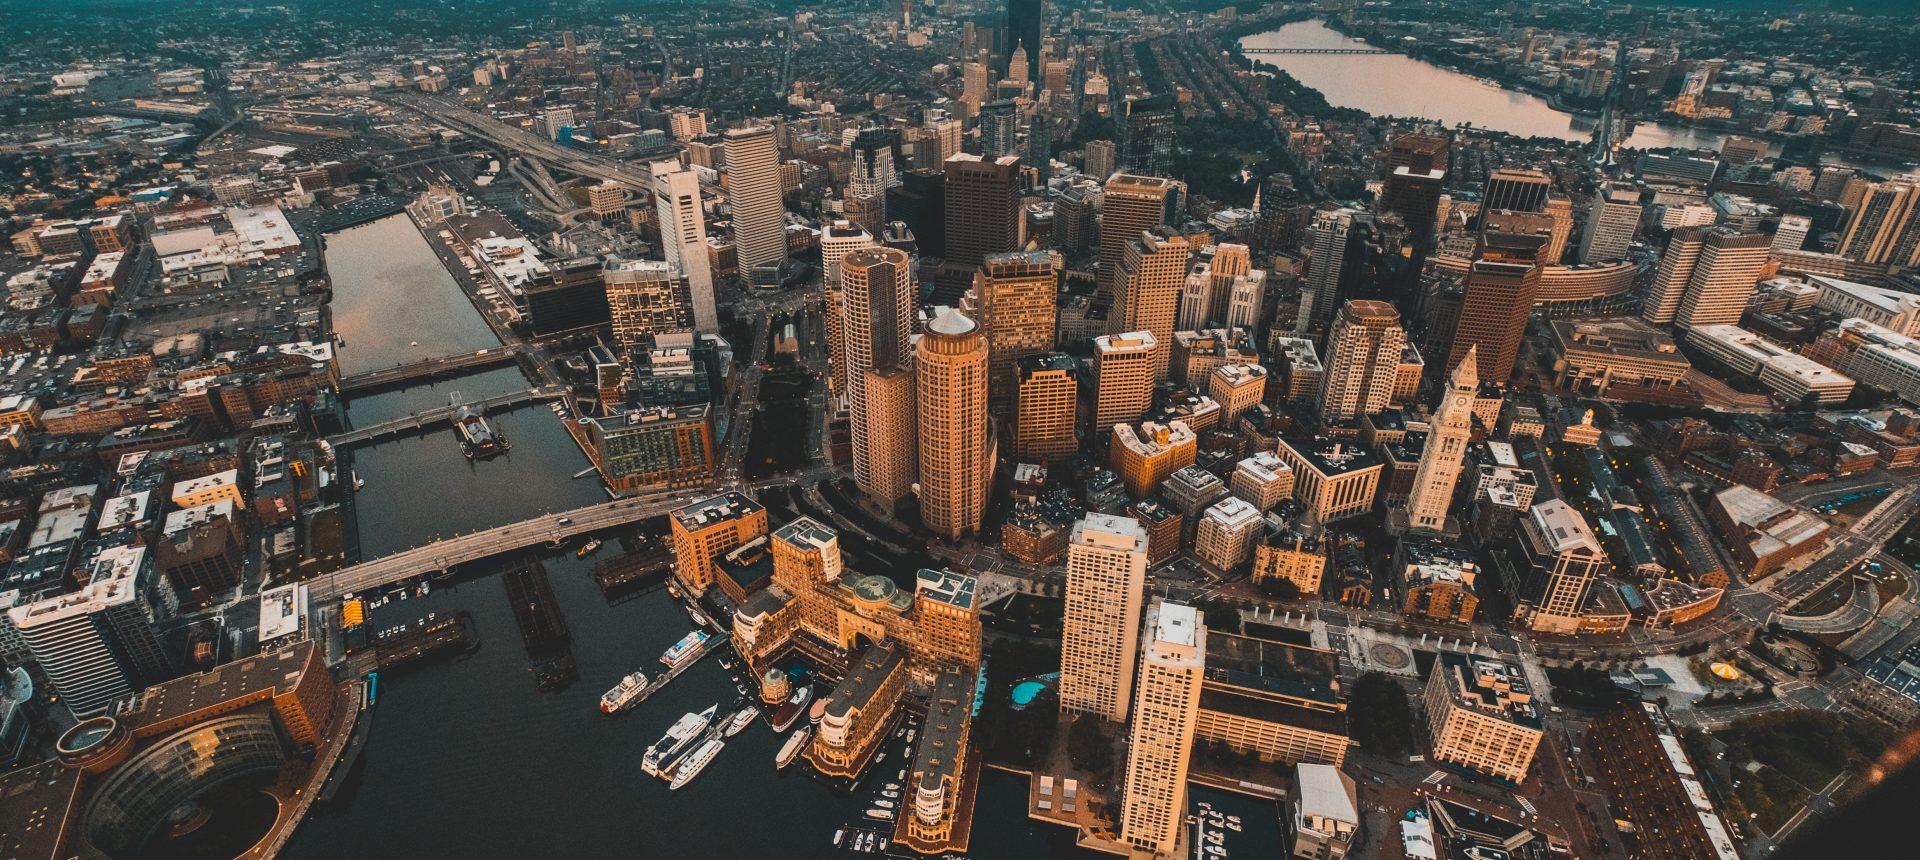 Boston-Aerial-1-1920x860.jpg